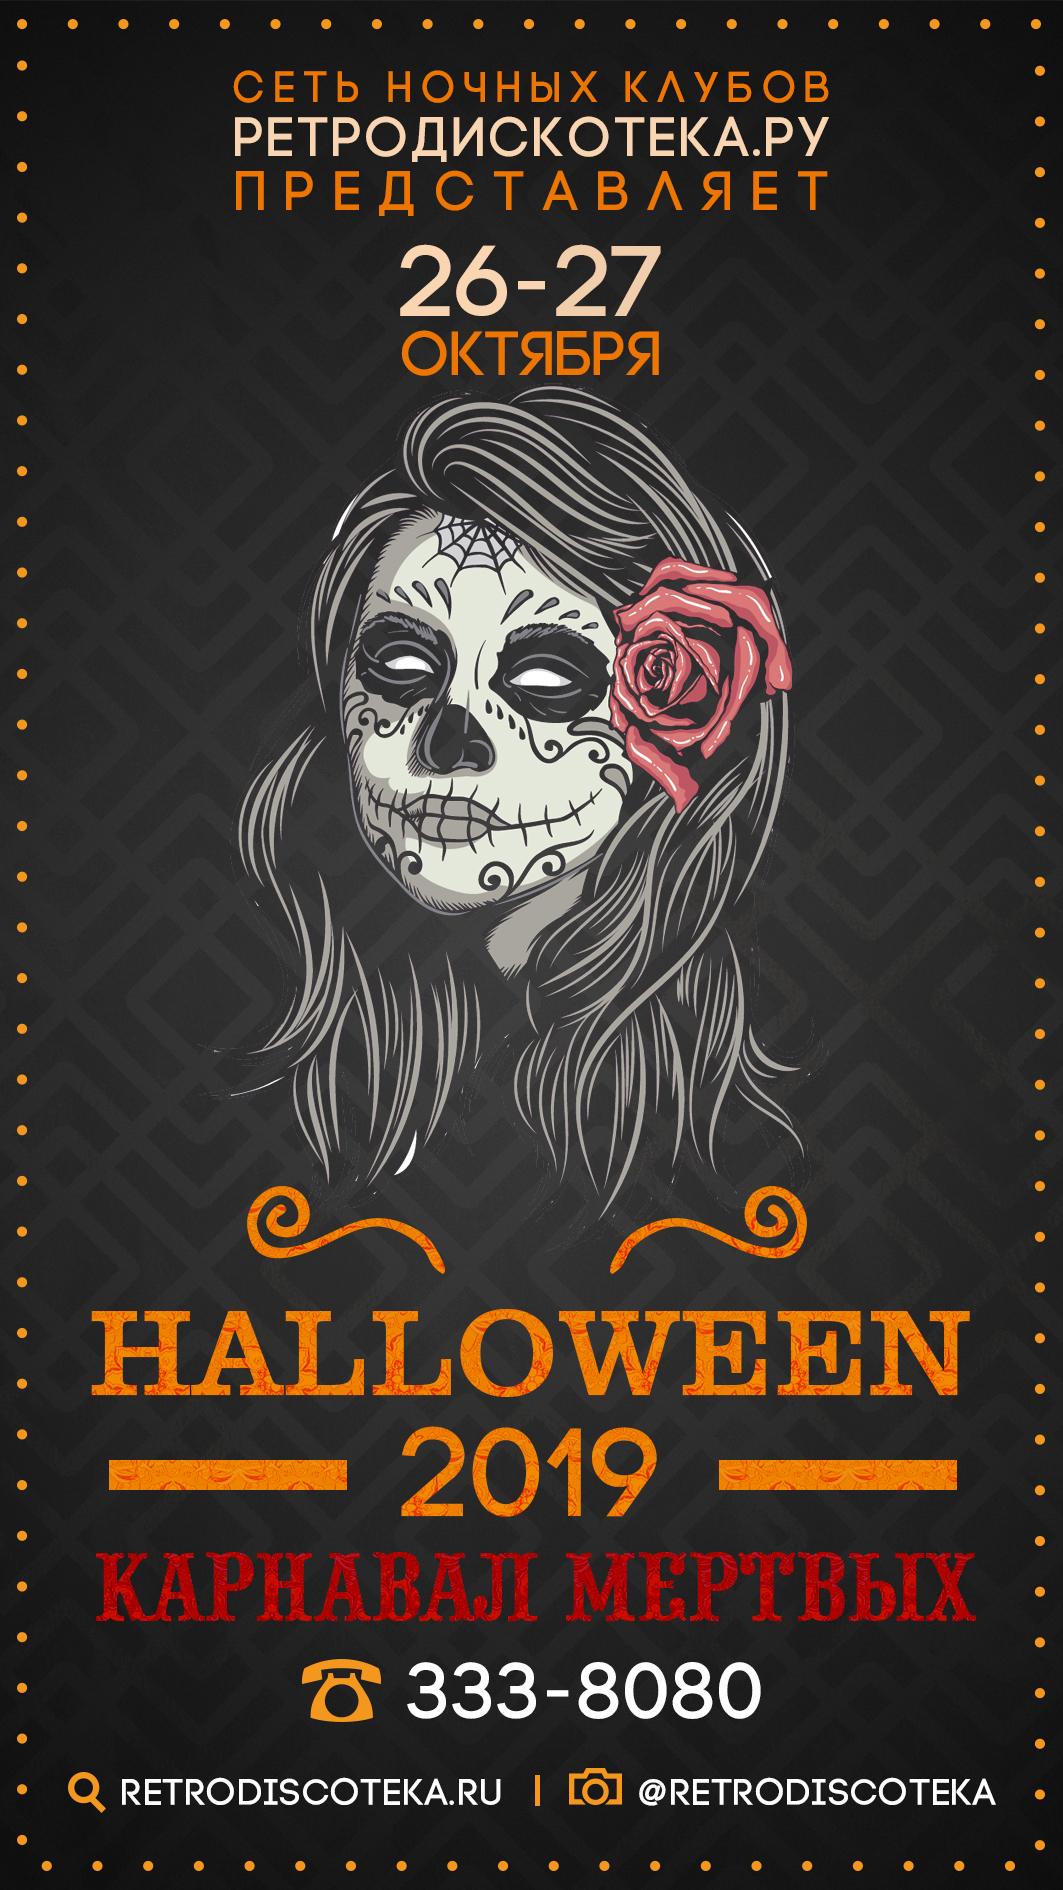 Дизайн афиши Хэллоуин 2019 для сети ночных клубов фото f_1425c6d6a79d16ae.jpg